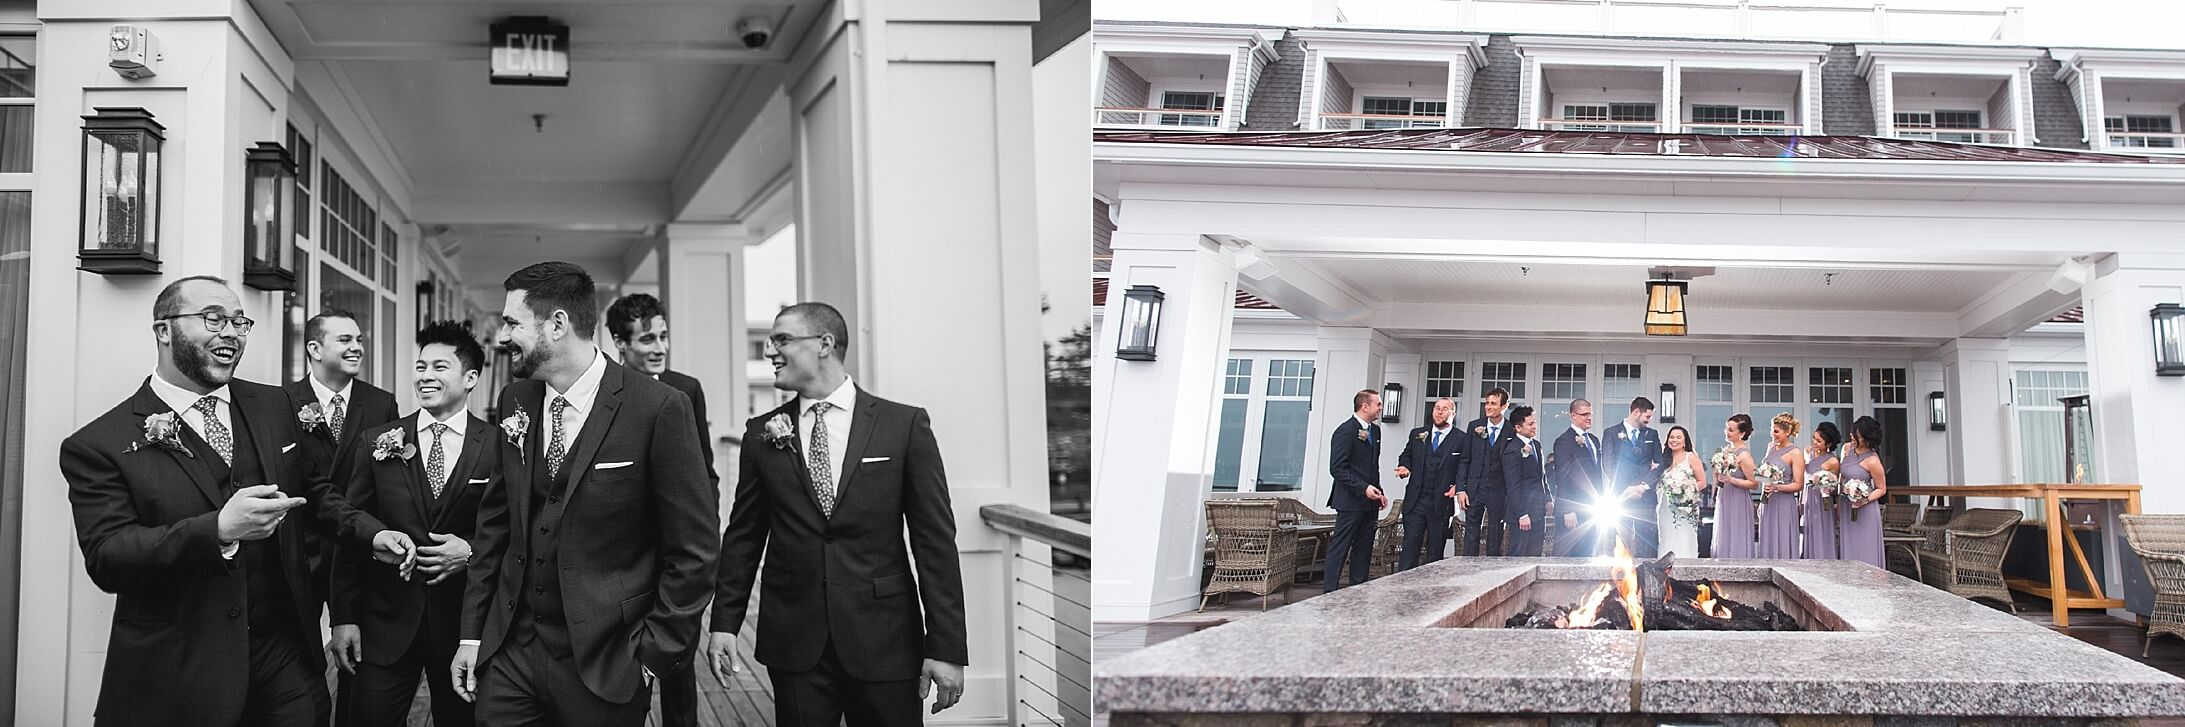 Beauport Hotel Wedding - Ebersole Photo_0002.jpg